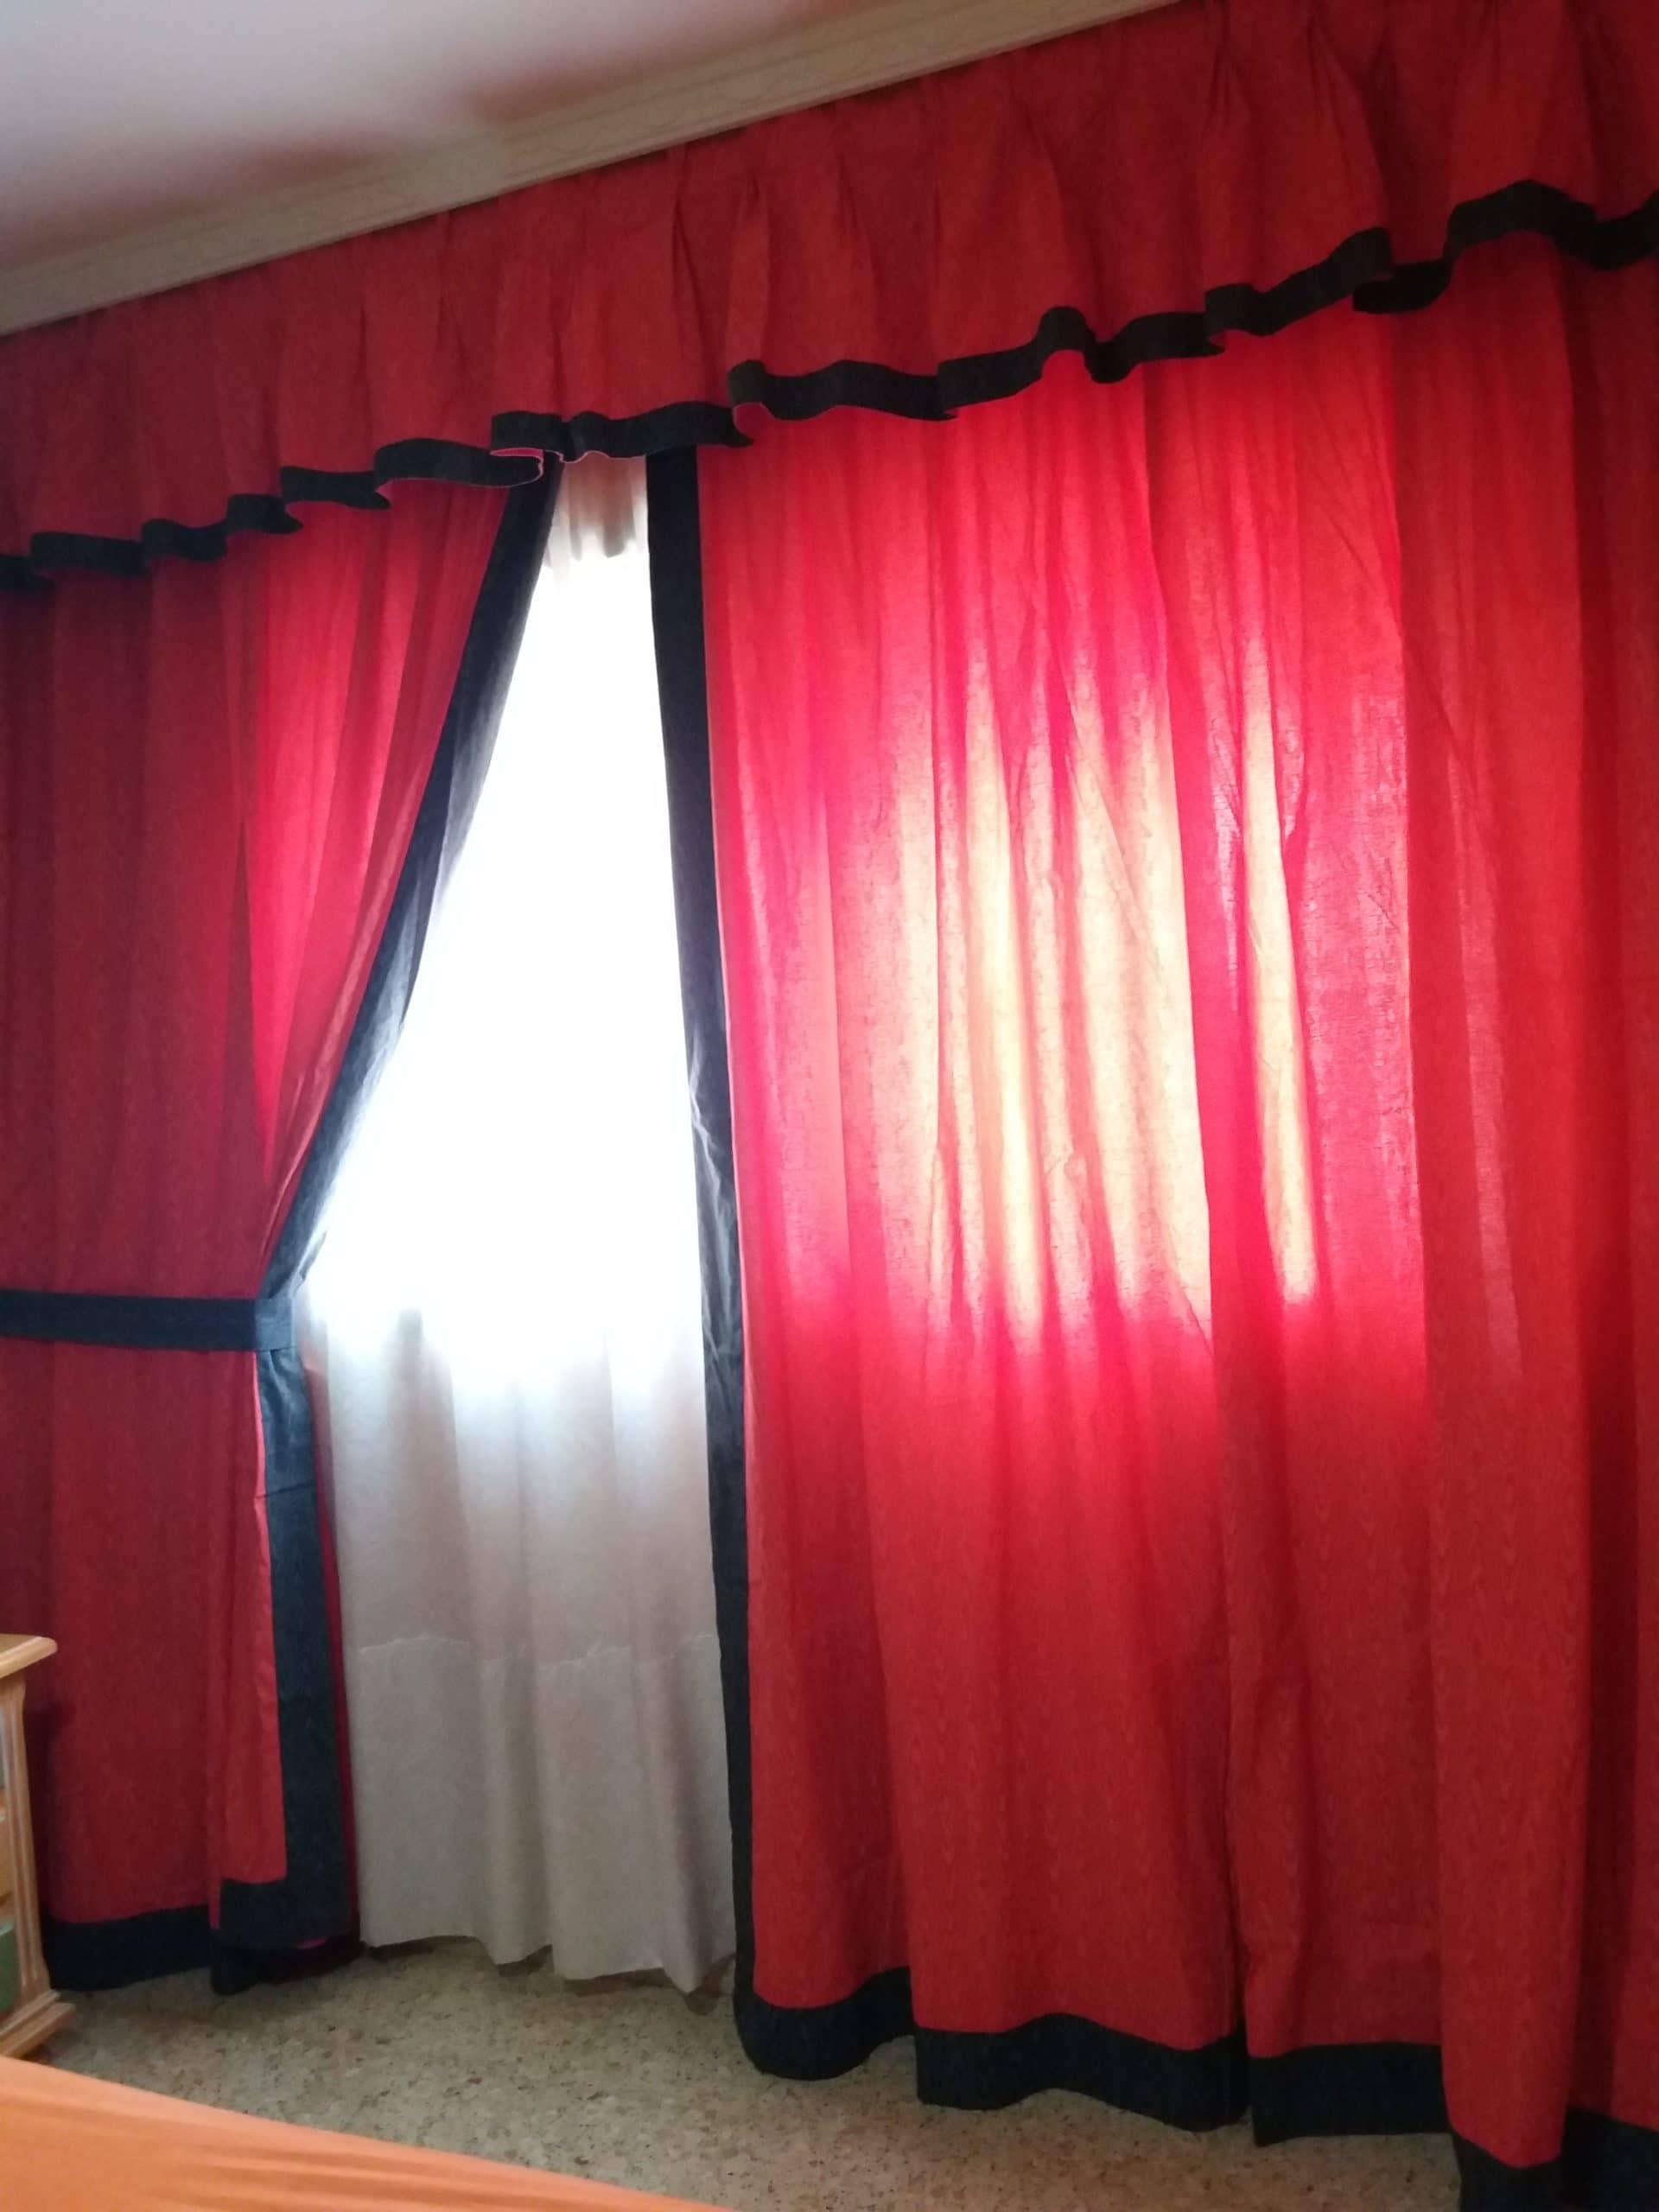 Cortina roja con ribetes negros